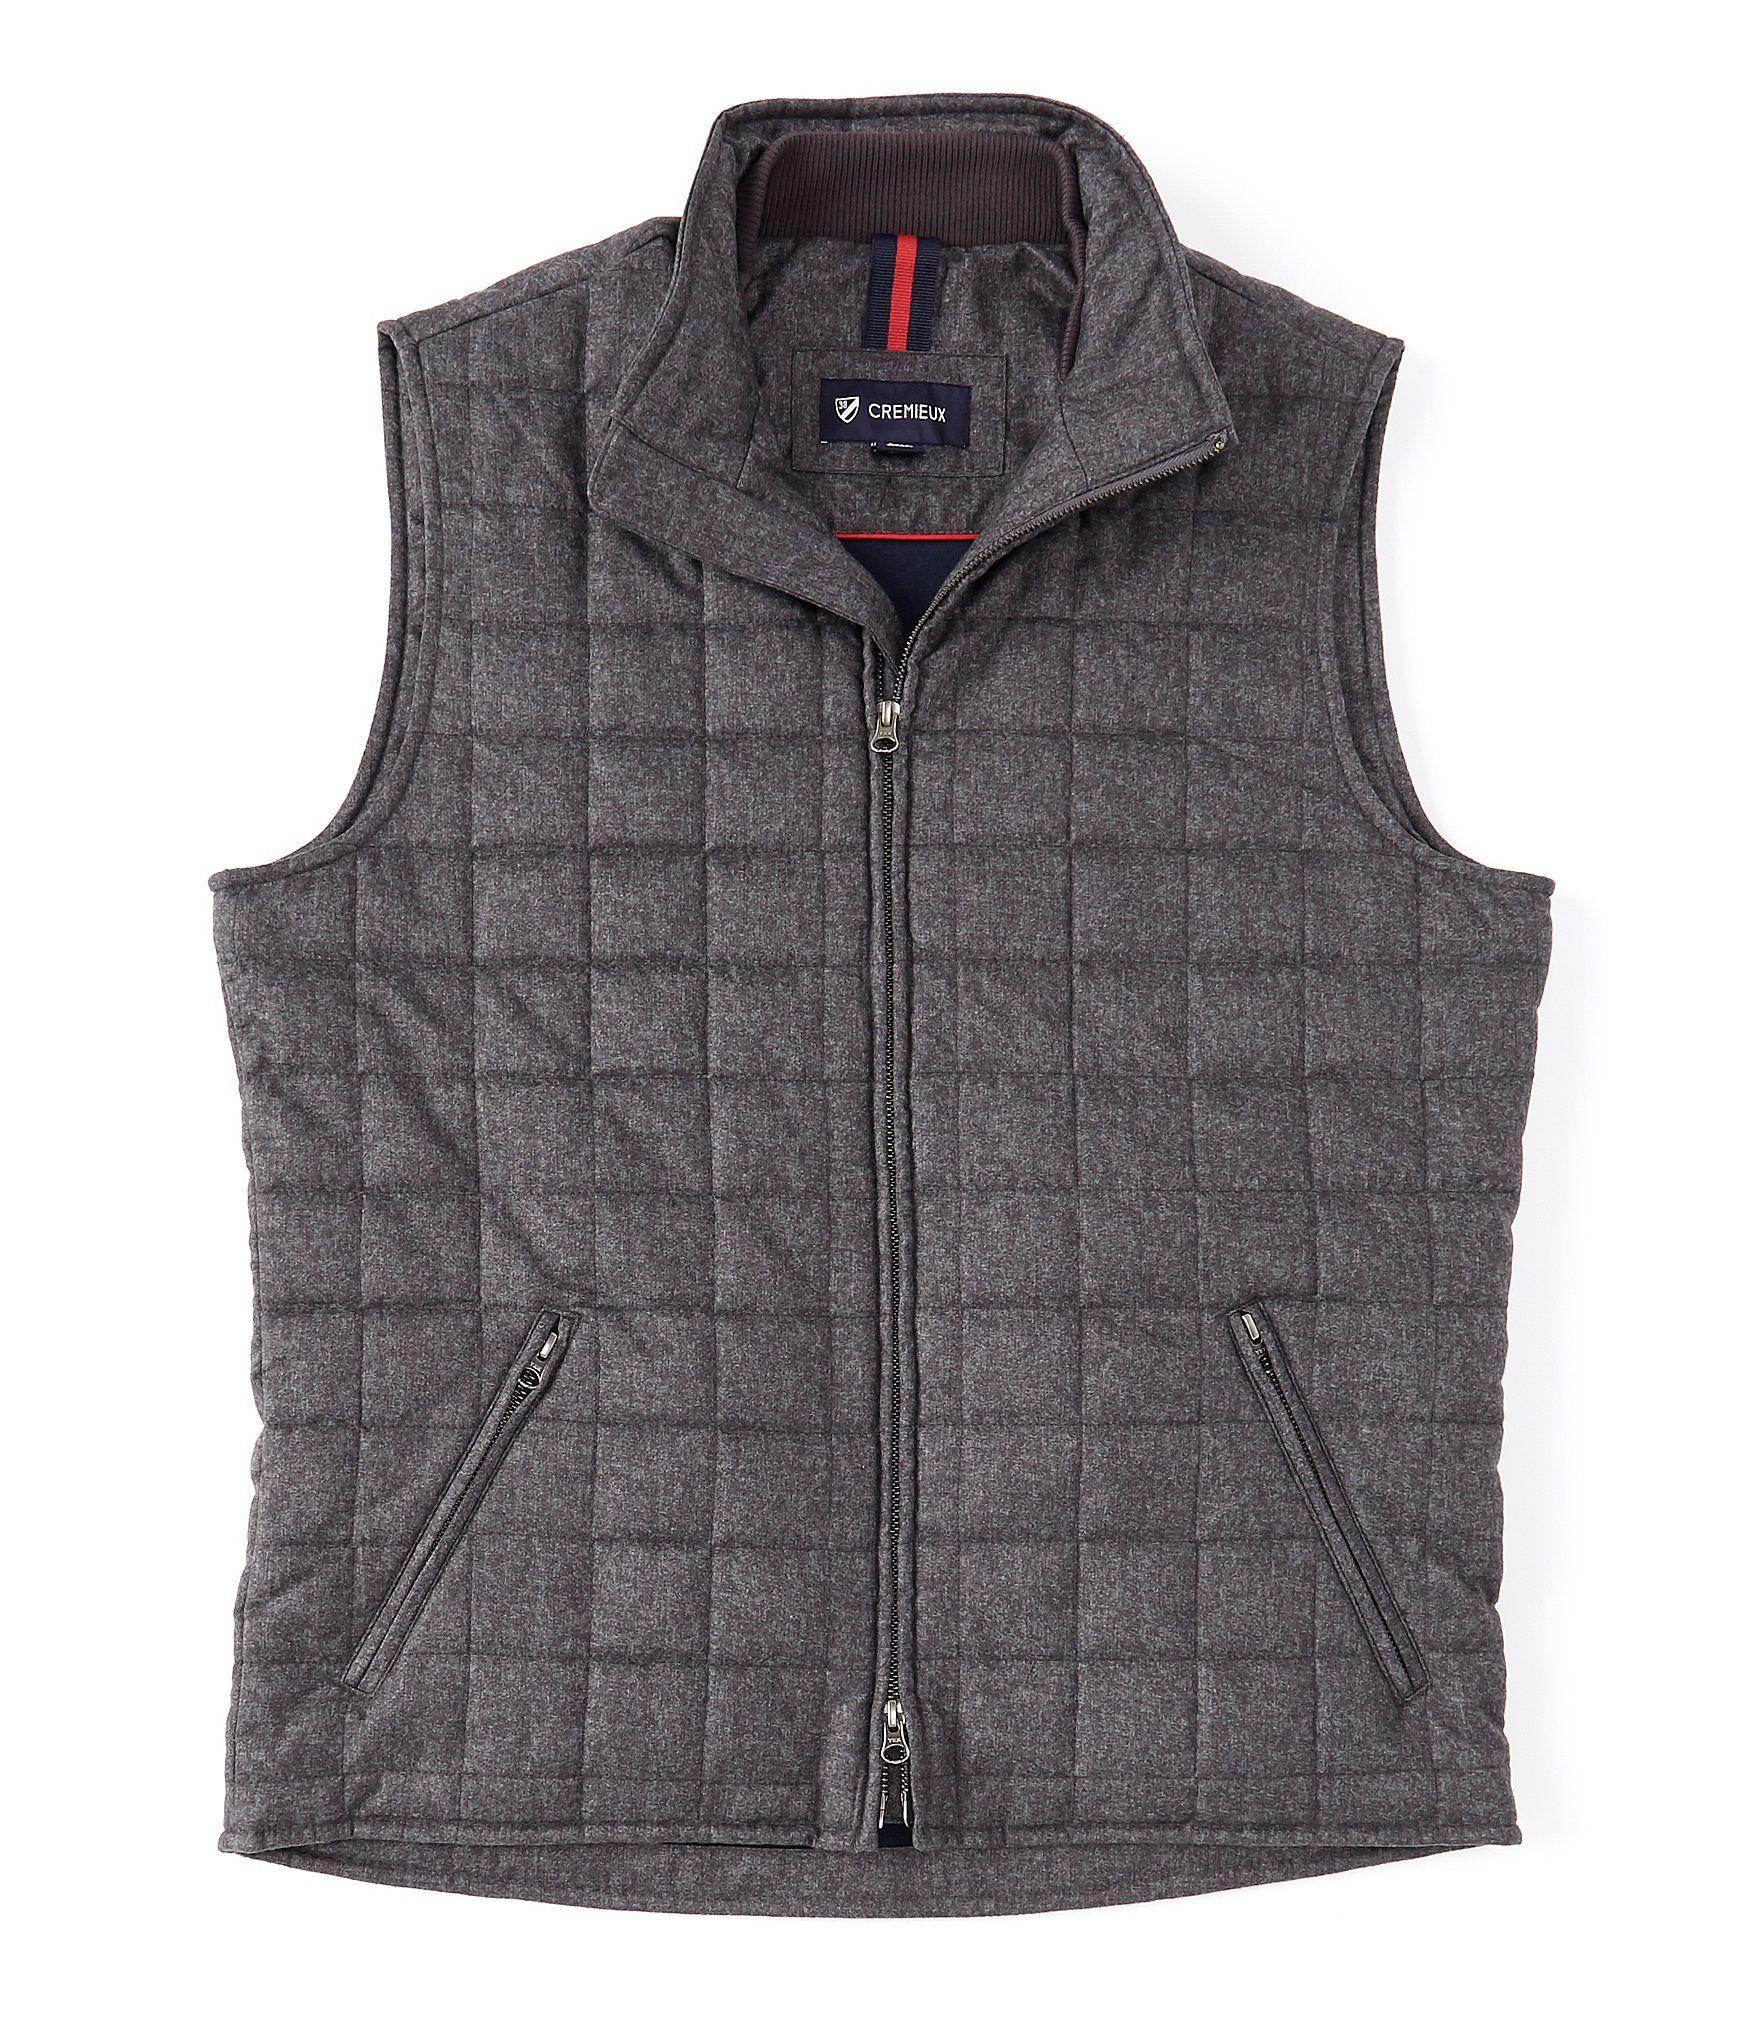 Cremieux Bryan Brushed Full-Zip Quilted Vest | Dillard's